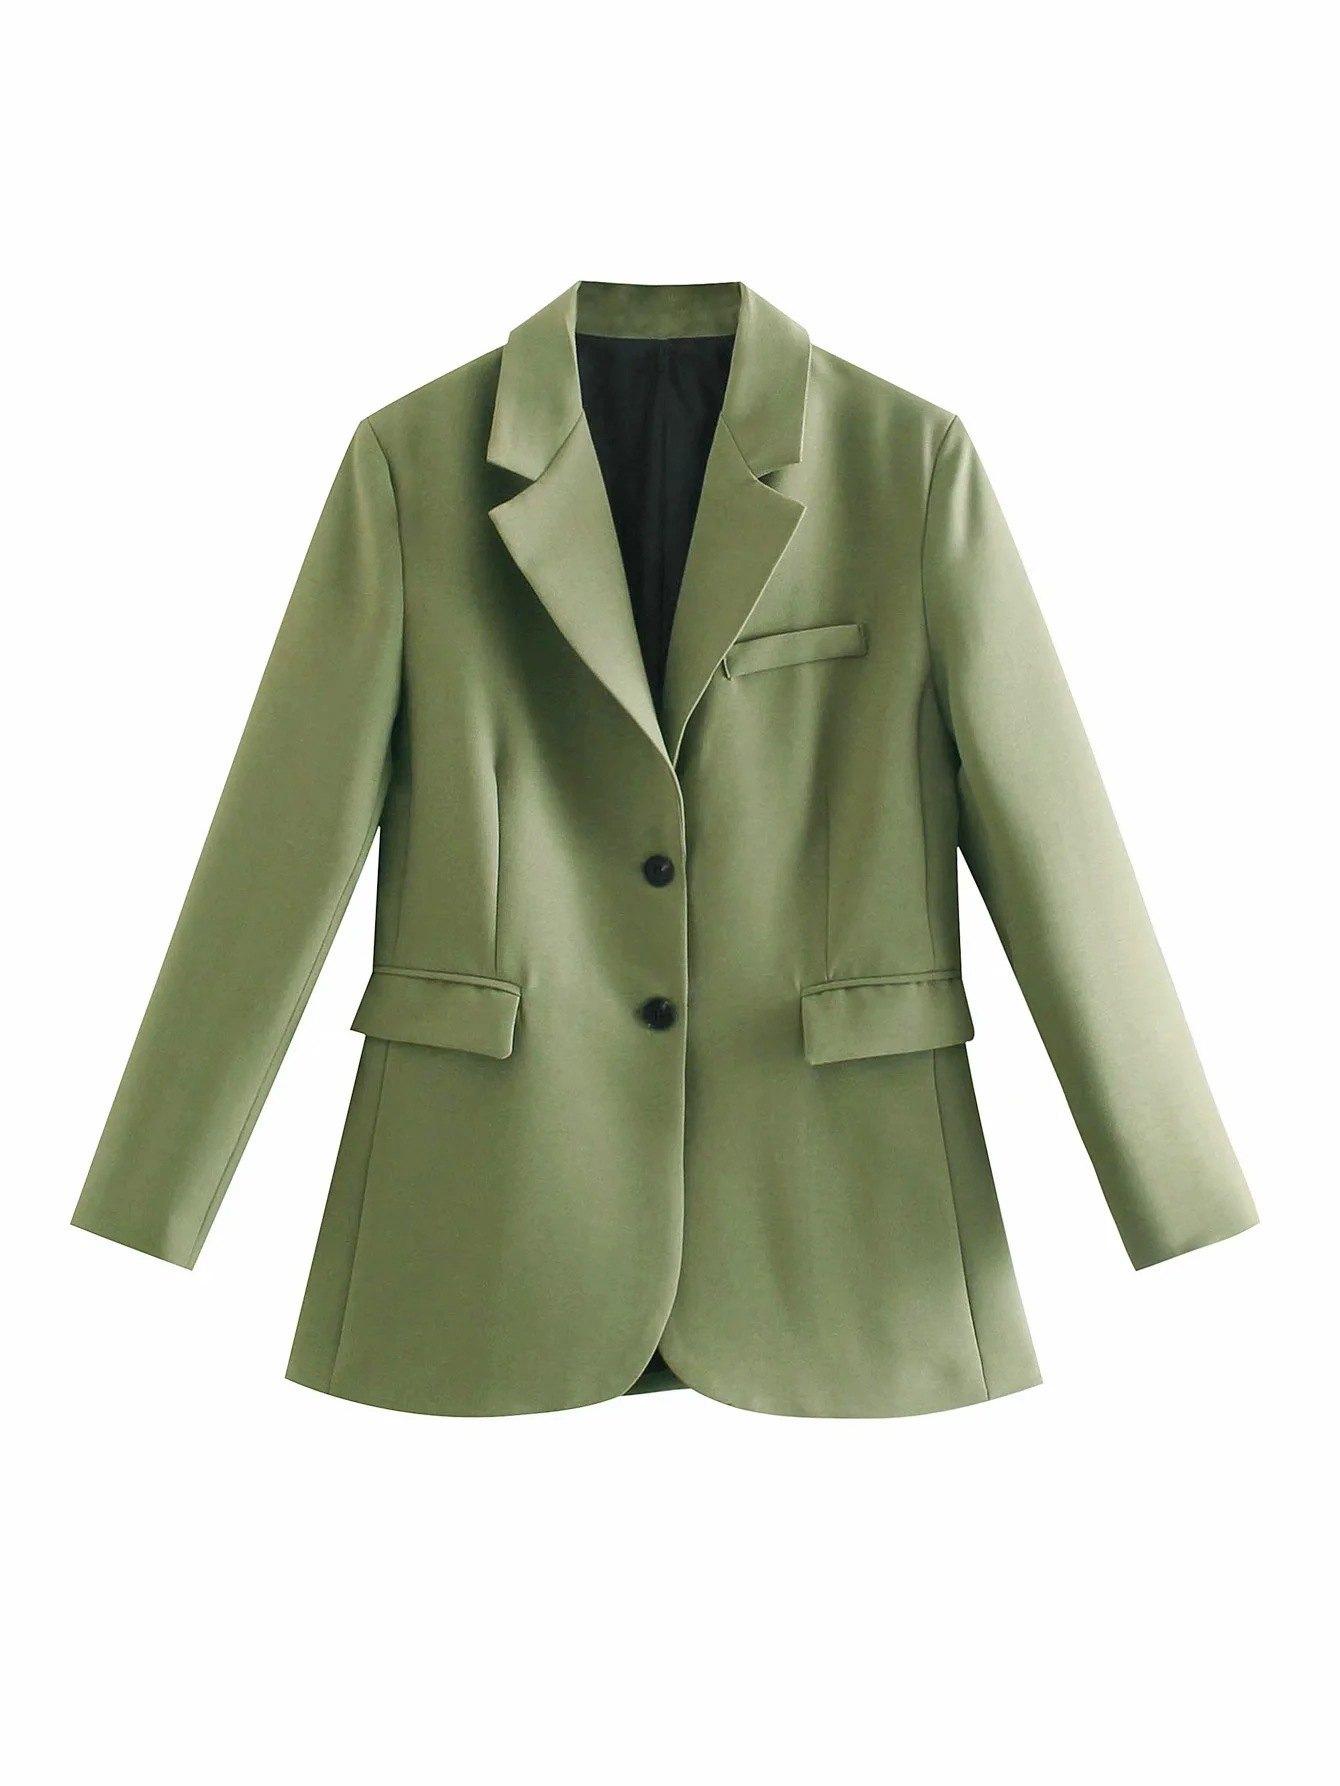 Long Sleeve Buttoned Blazer - Green S